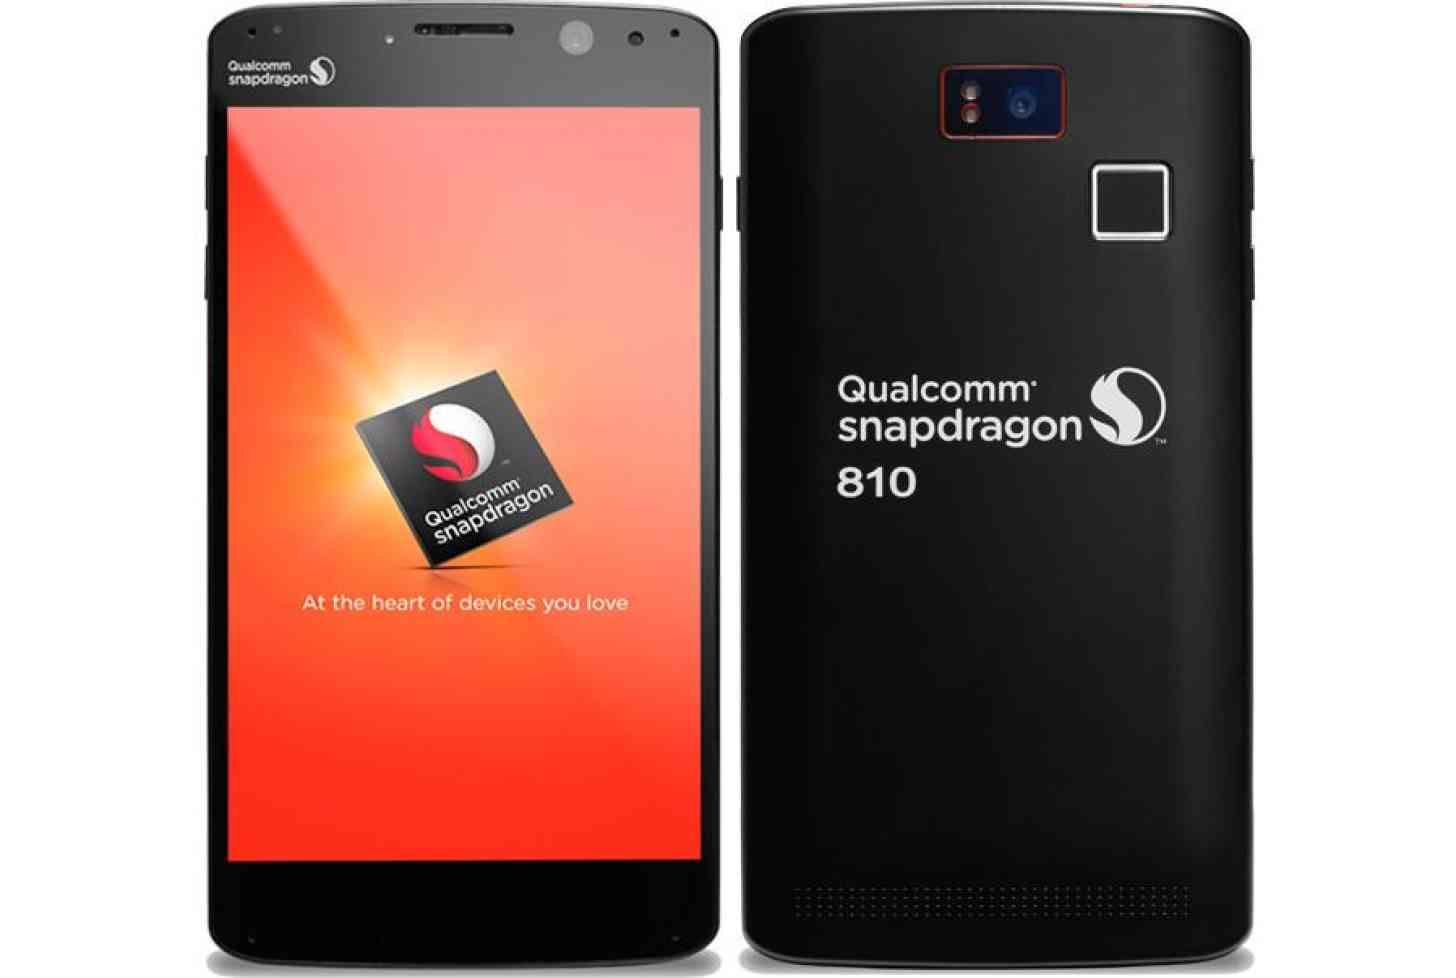 Qualcomm Snapdragon 810 MDP Smartphone